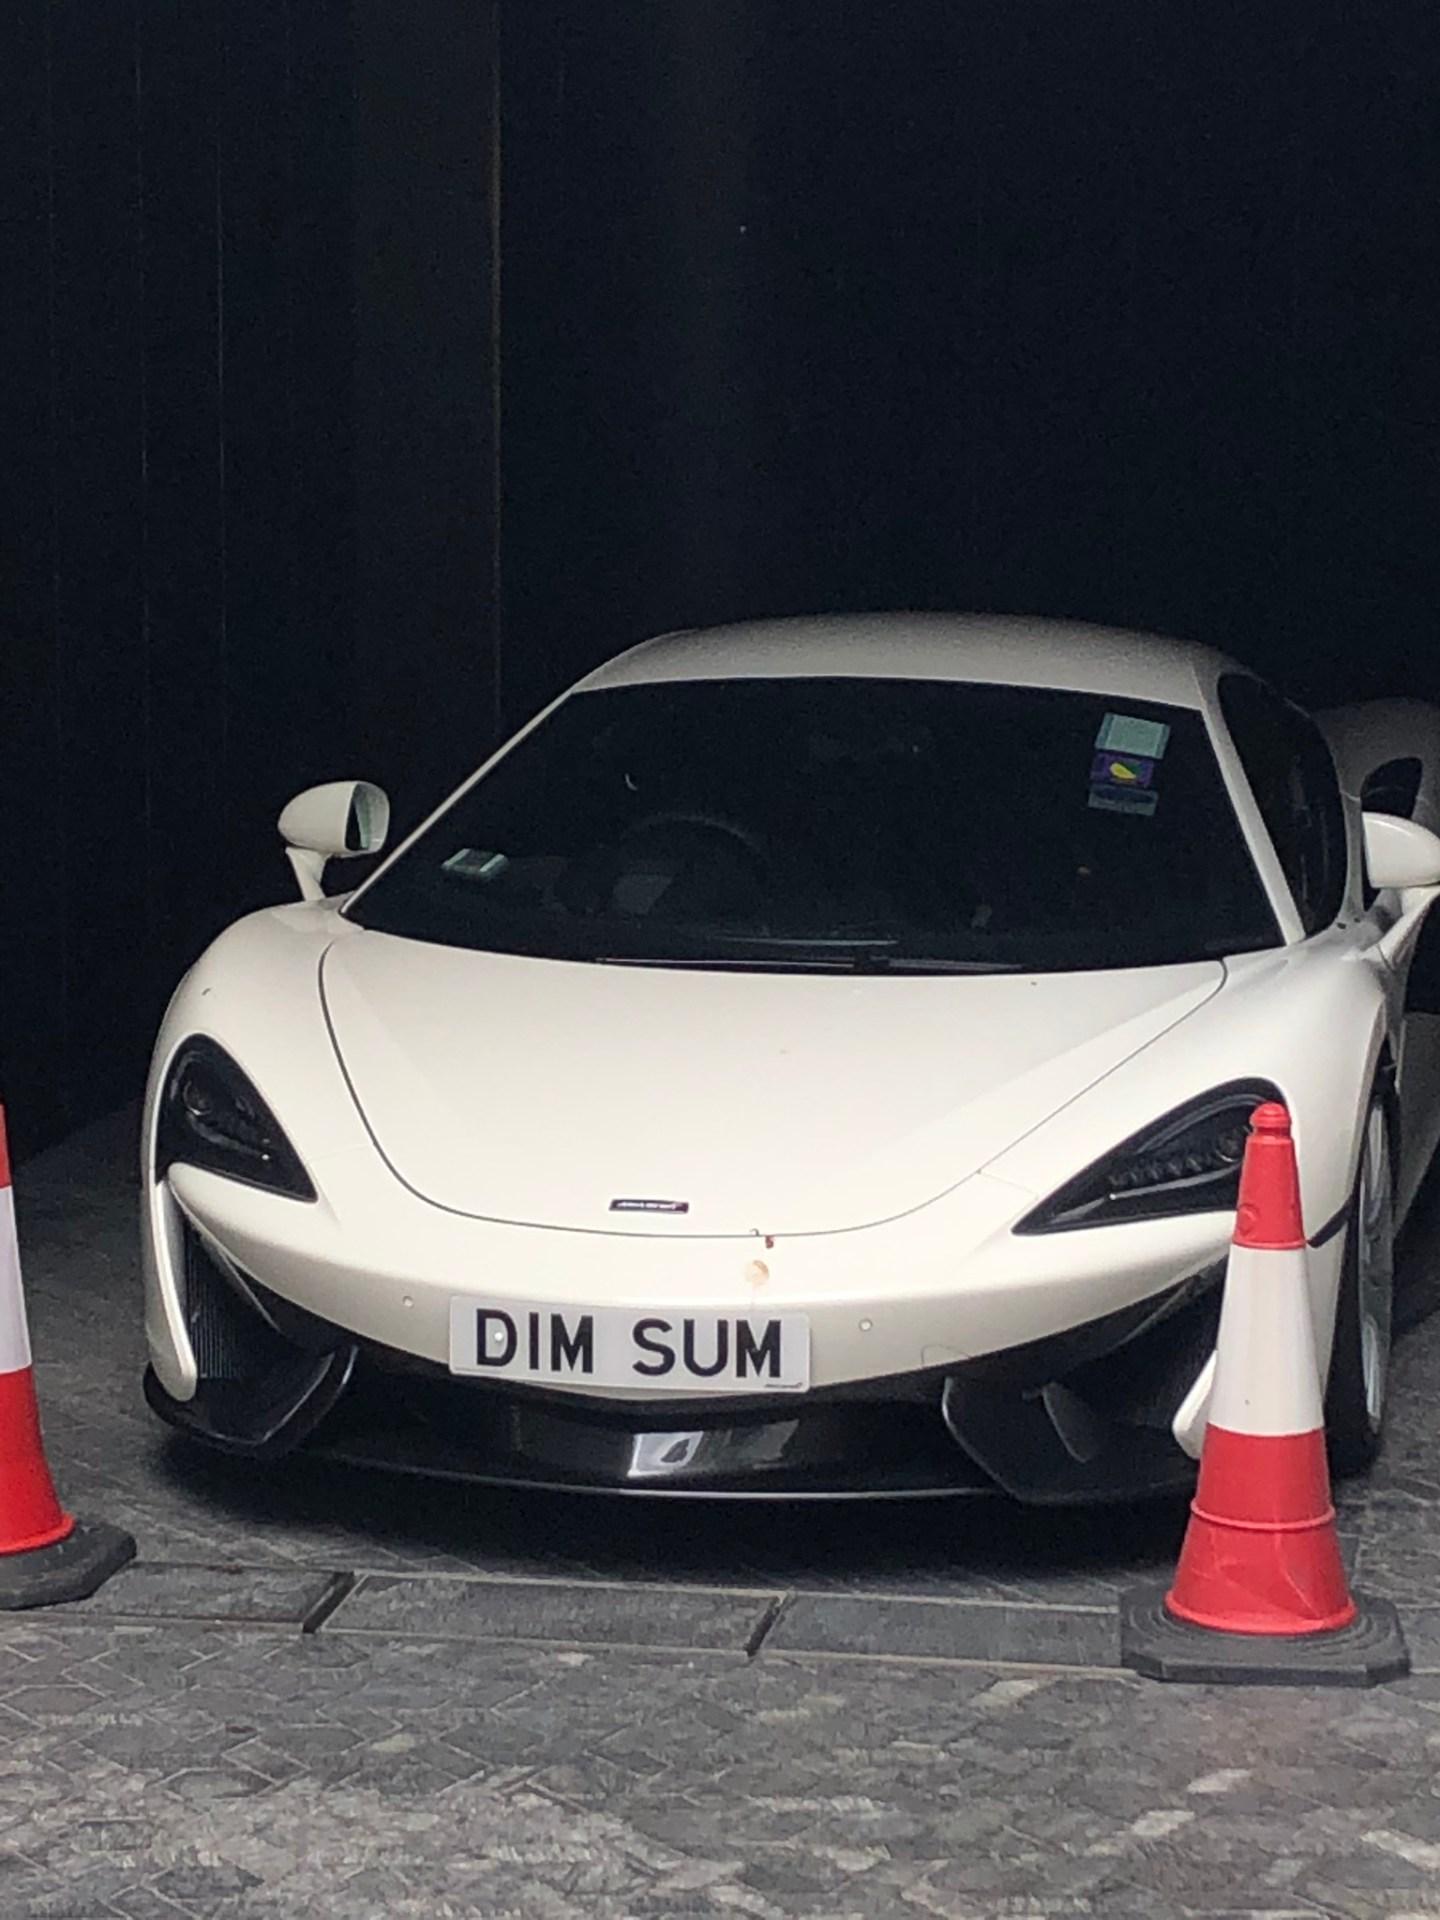 Dim Sum numberplate in Hong Kong